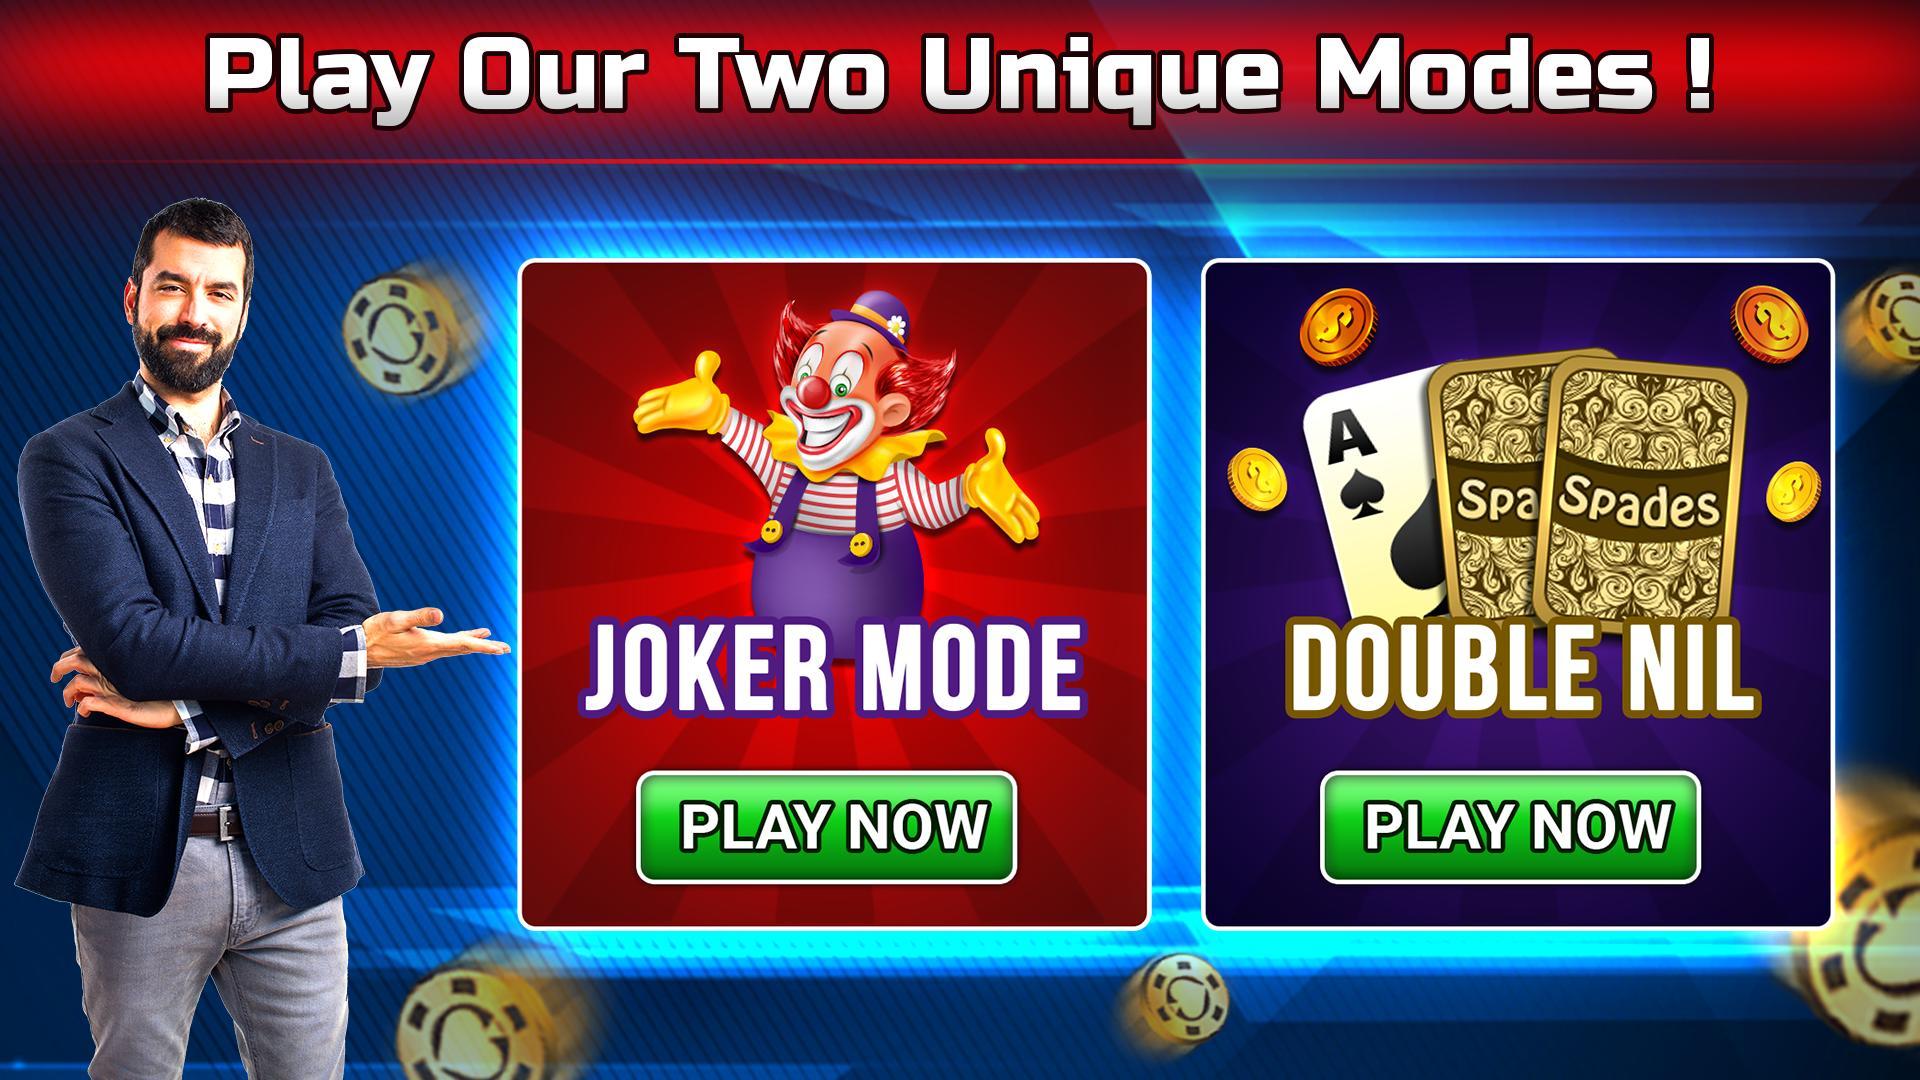 Spades Free - Multiplayer Online Card Game 1.6.3 Screenshot 8